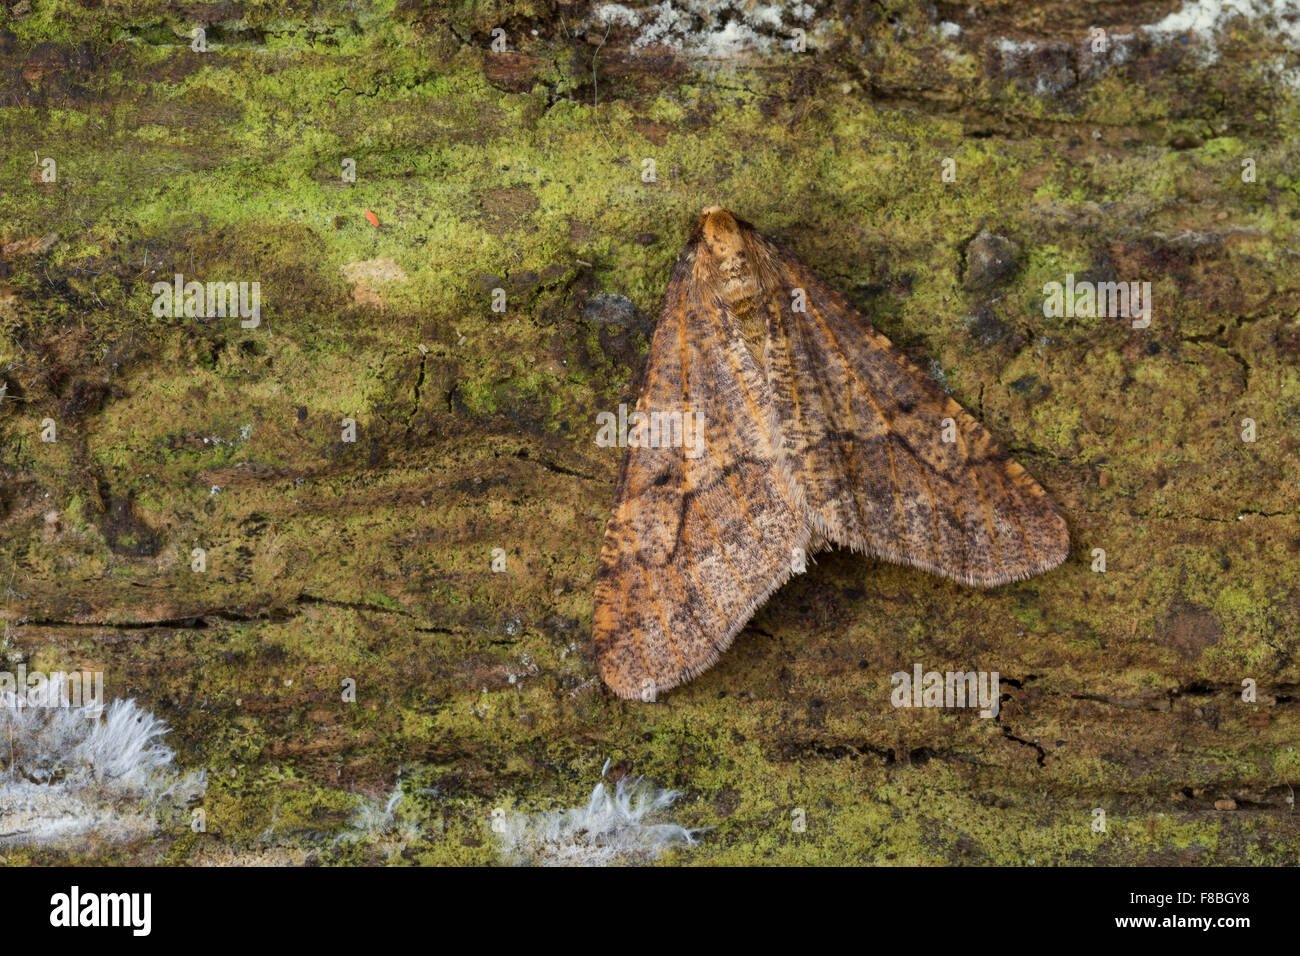 Mottled Umber, male, Großer Frostspanner, Männchen, Erannis defoliaria, Phalaena defoliaria, Hybernia - Stock Image